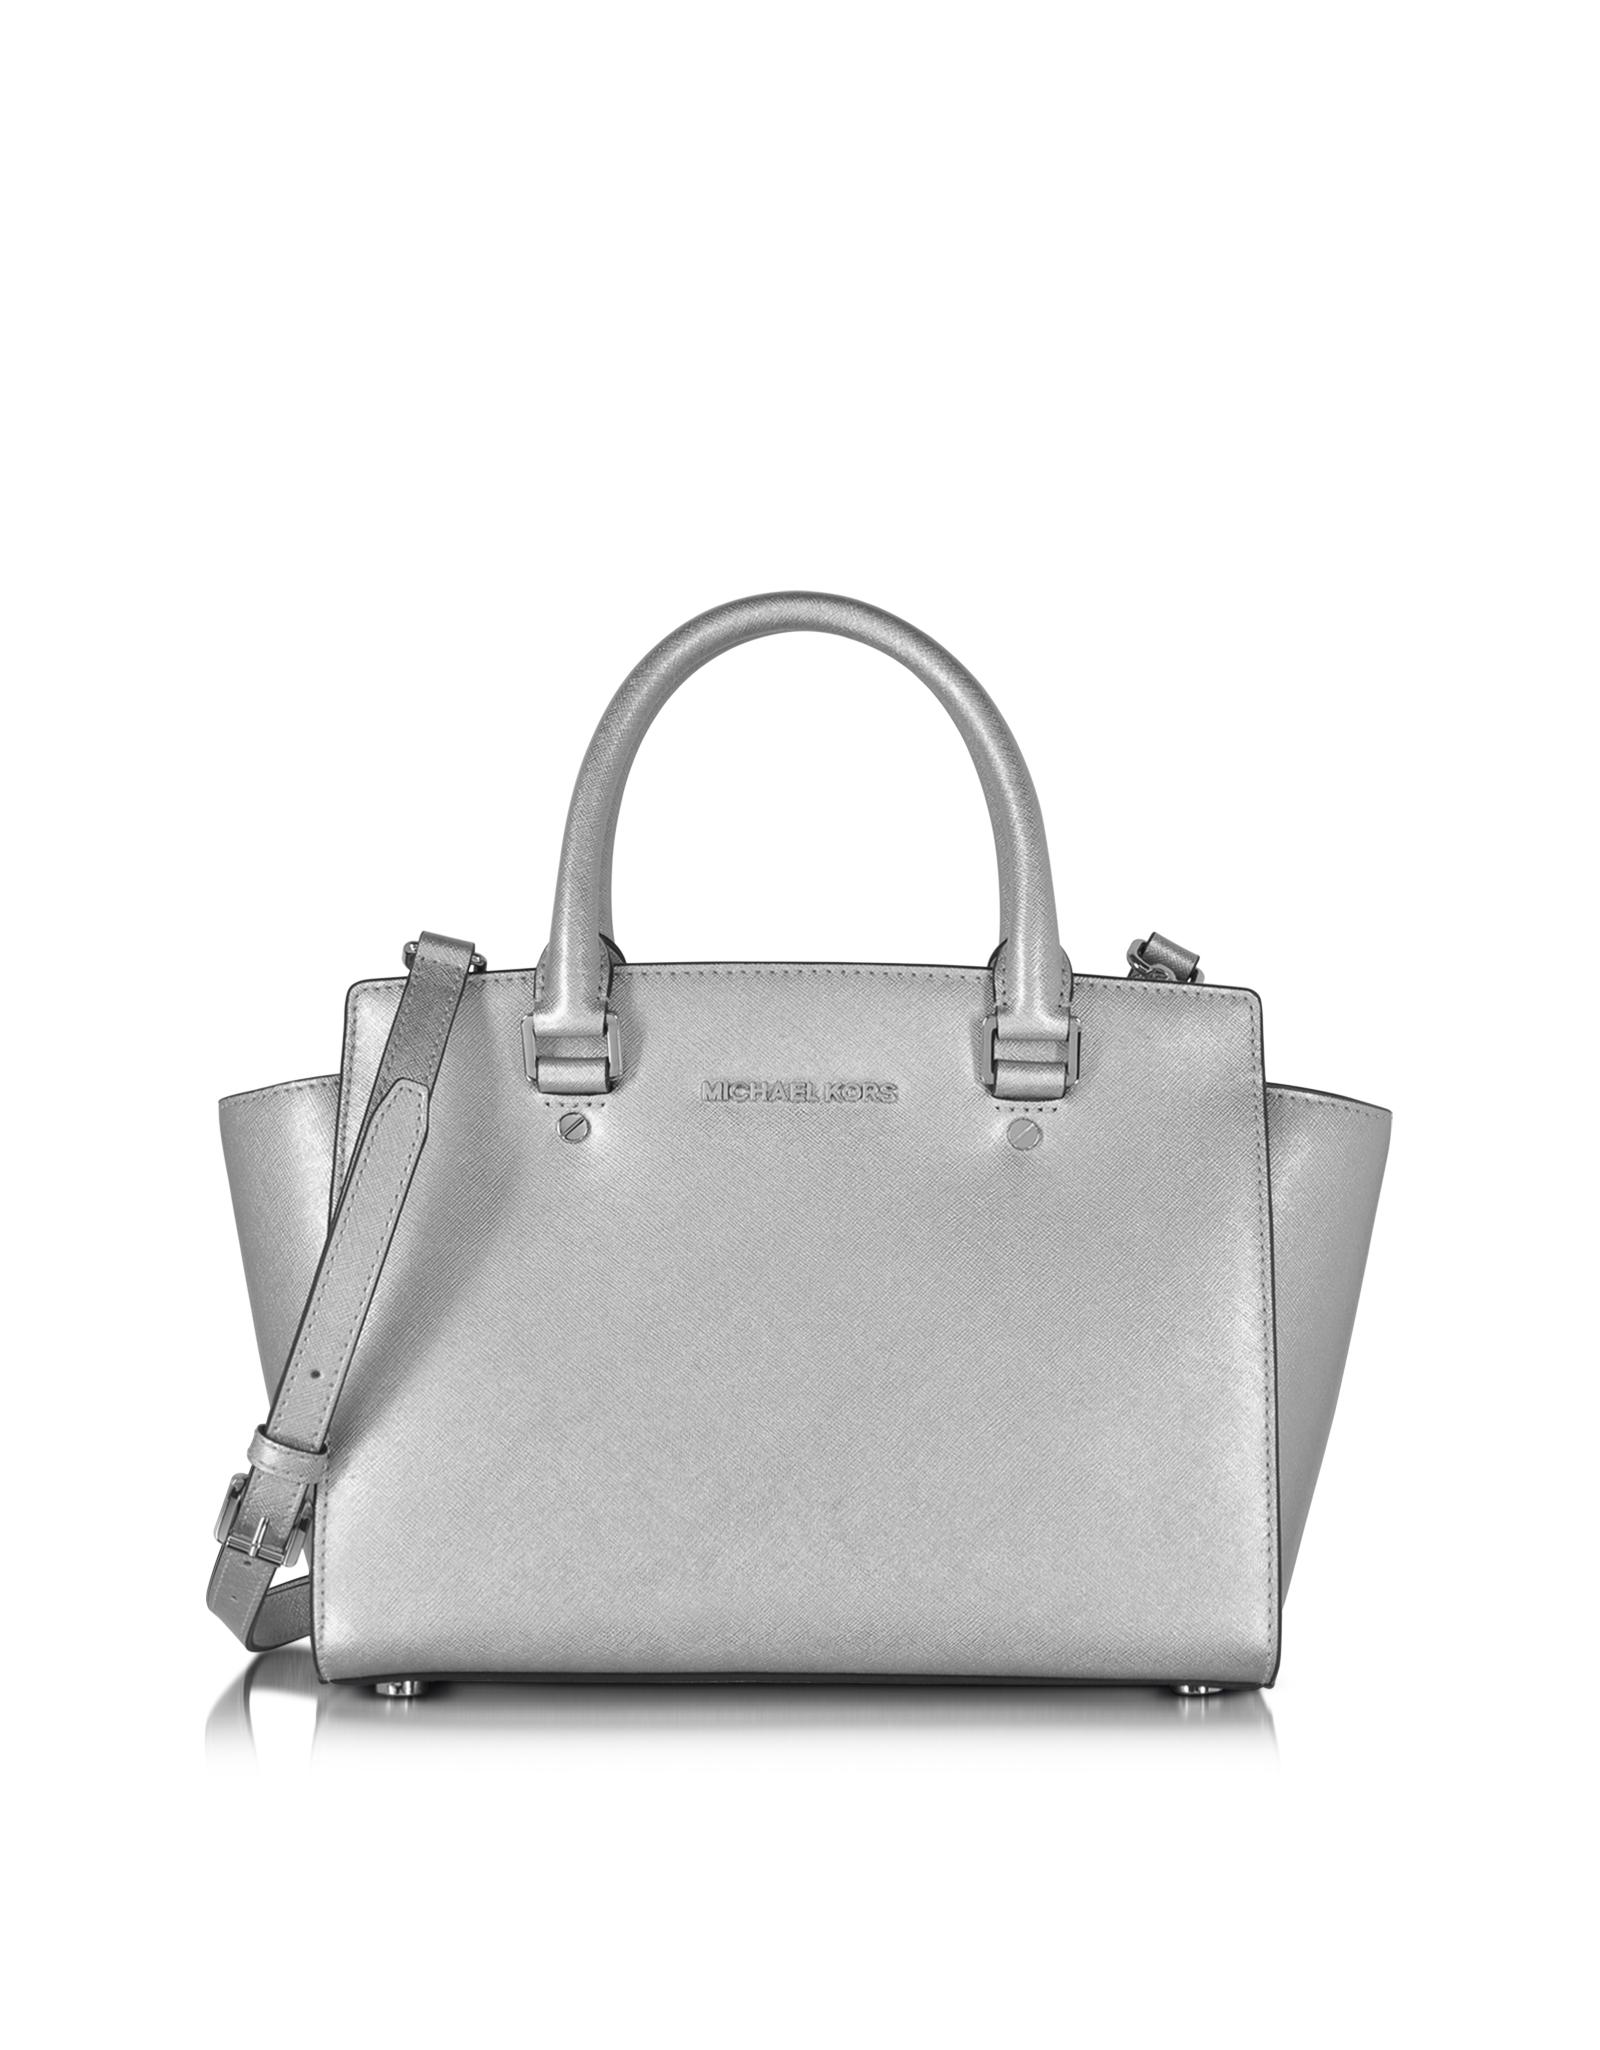 michael kors selma saffiano leather medium satchel bag in metallic rh lyst co uk